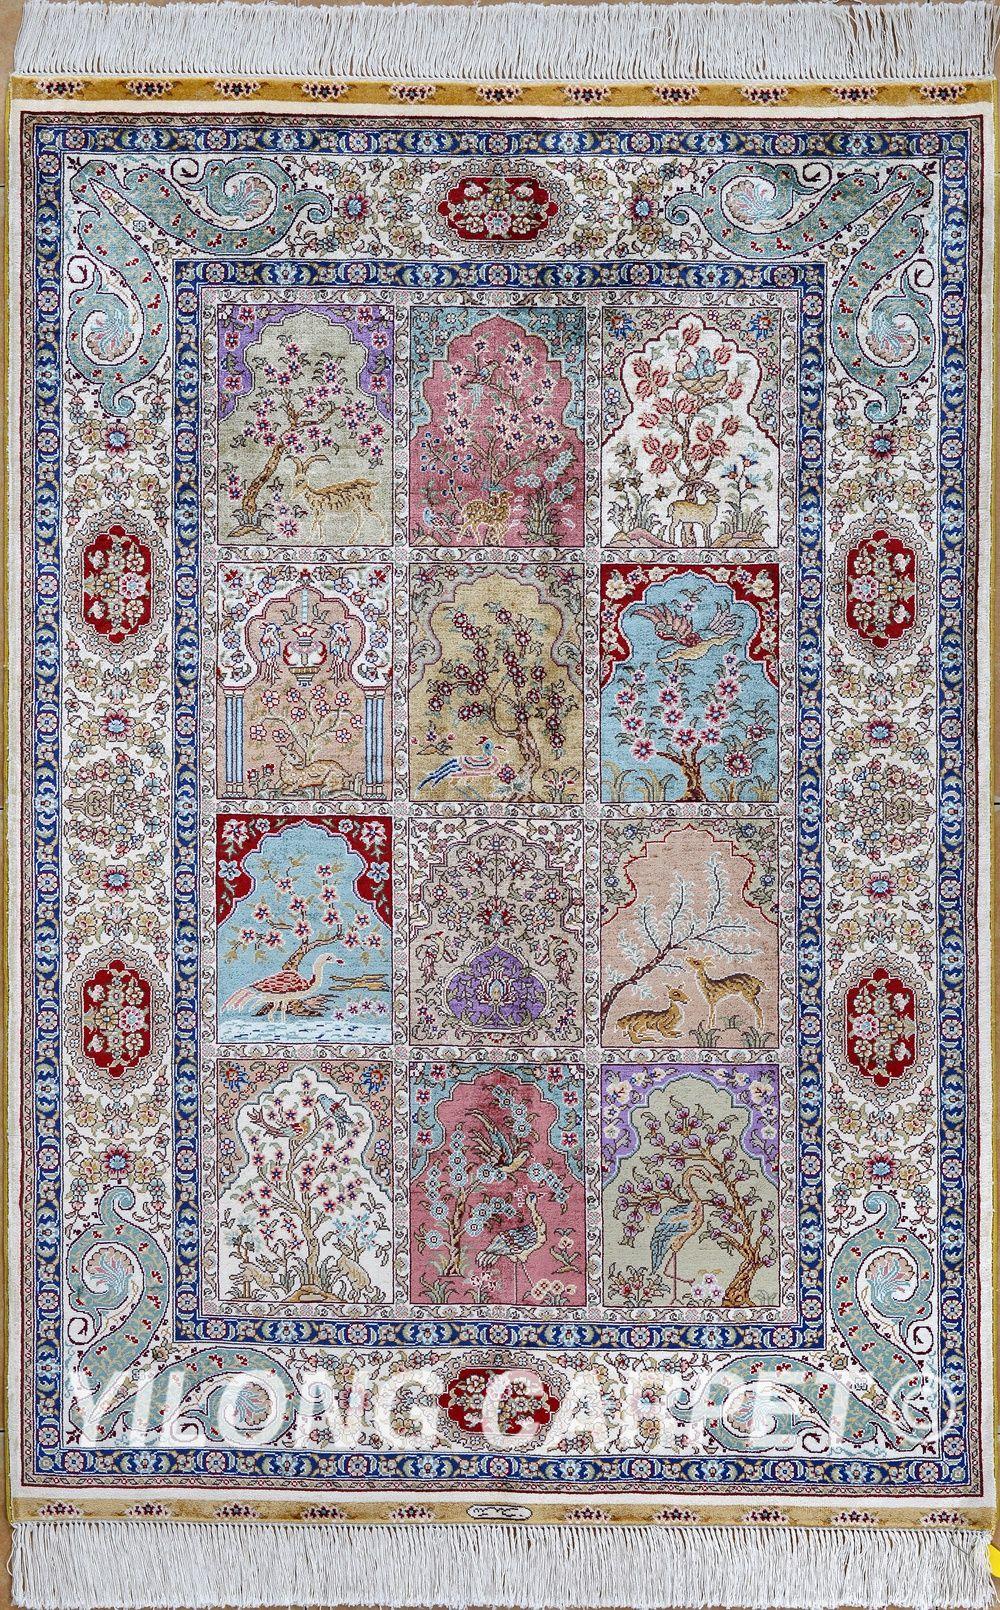 Purple Persian Rug Oriental Turkish Carpet Silk Tabriz Rugs Hereke Area Materials Style Traditional Dyeing Vegetable Technology